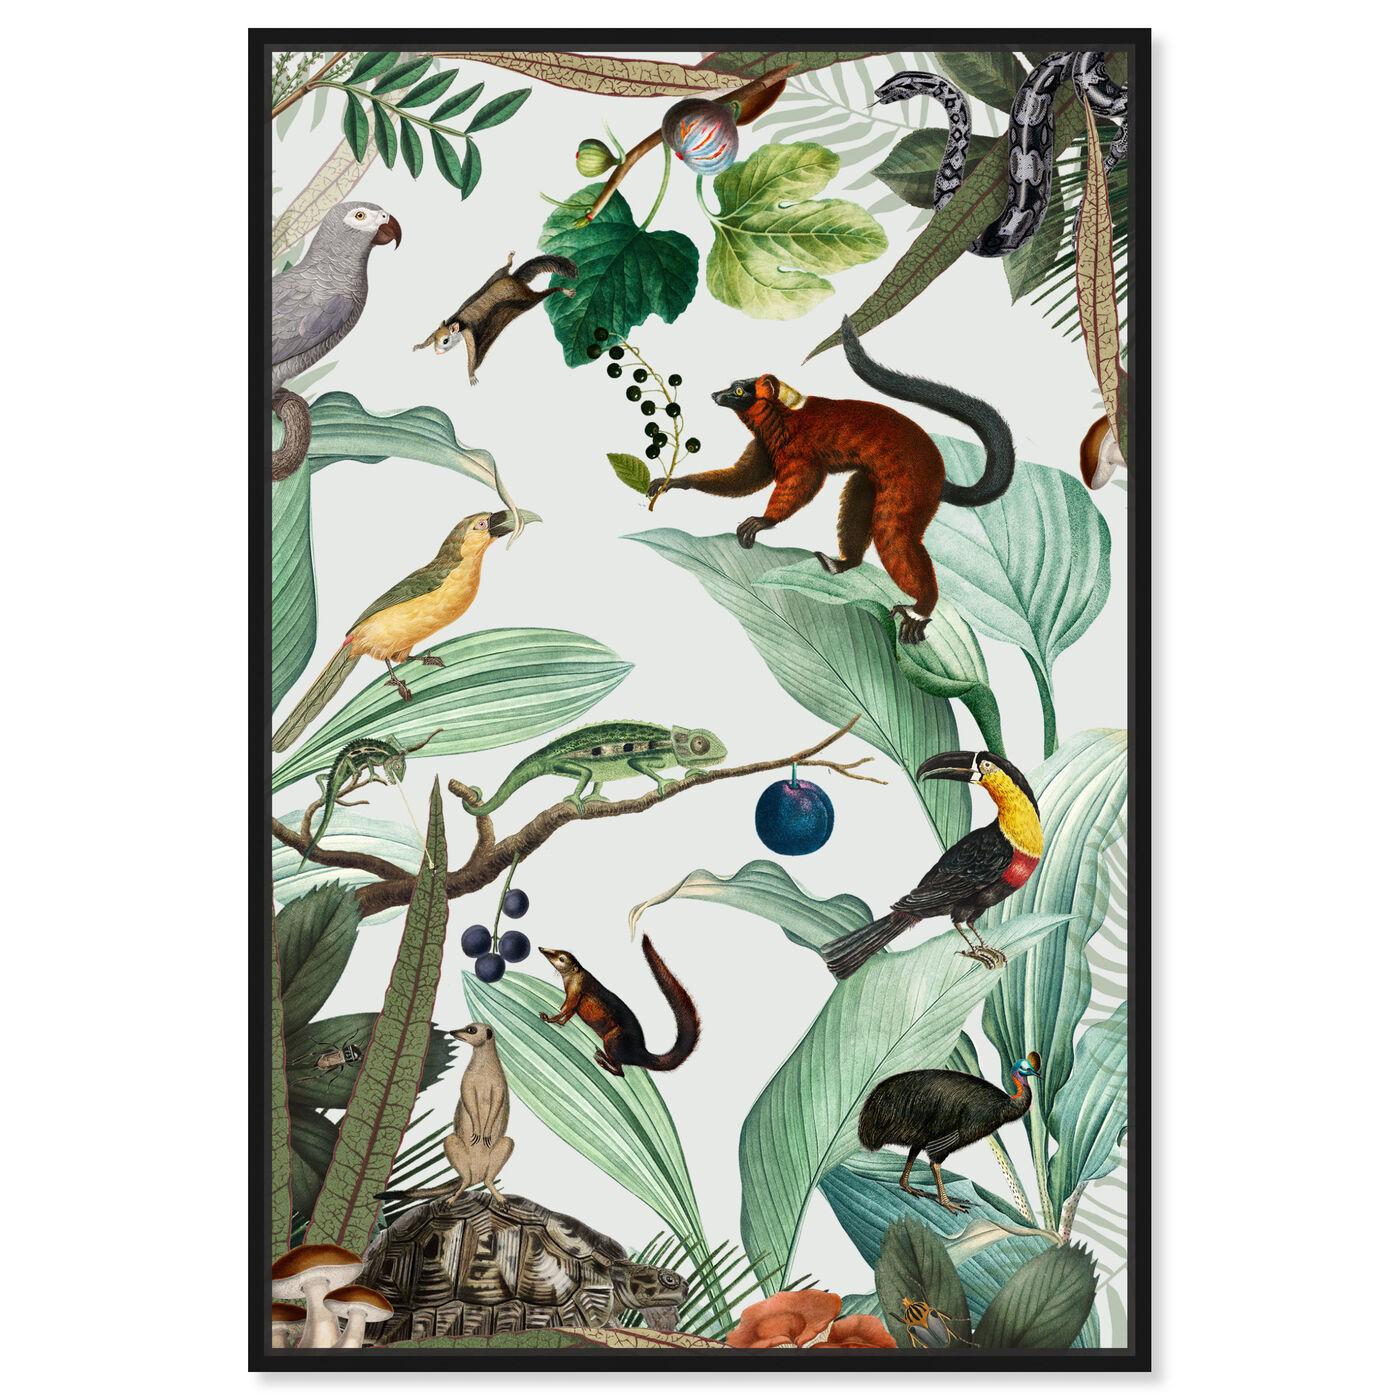 Front view of La Jungla del Fruto featuring animals and birds art.